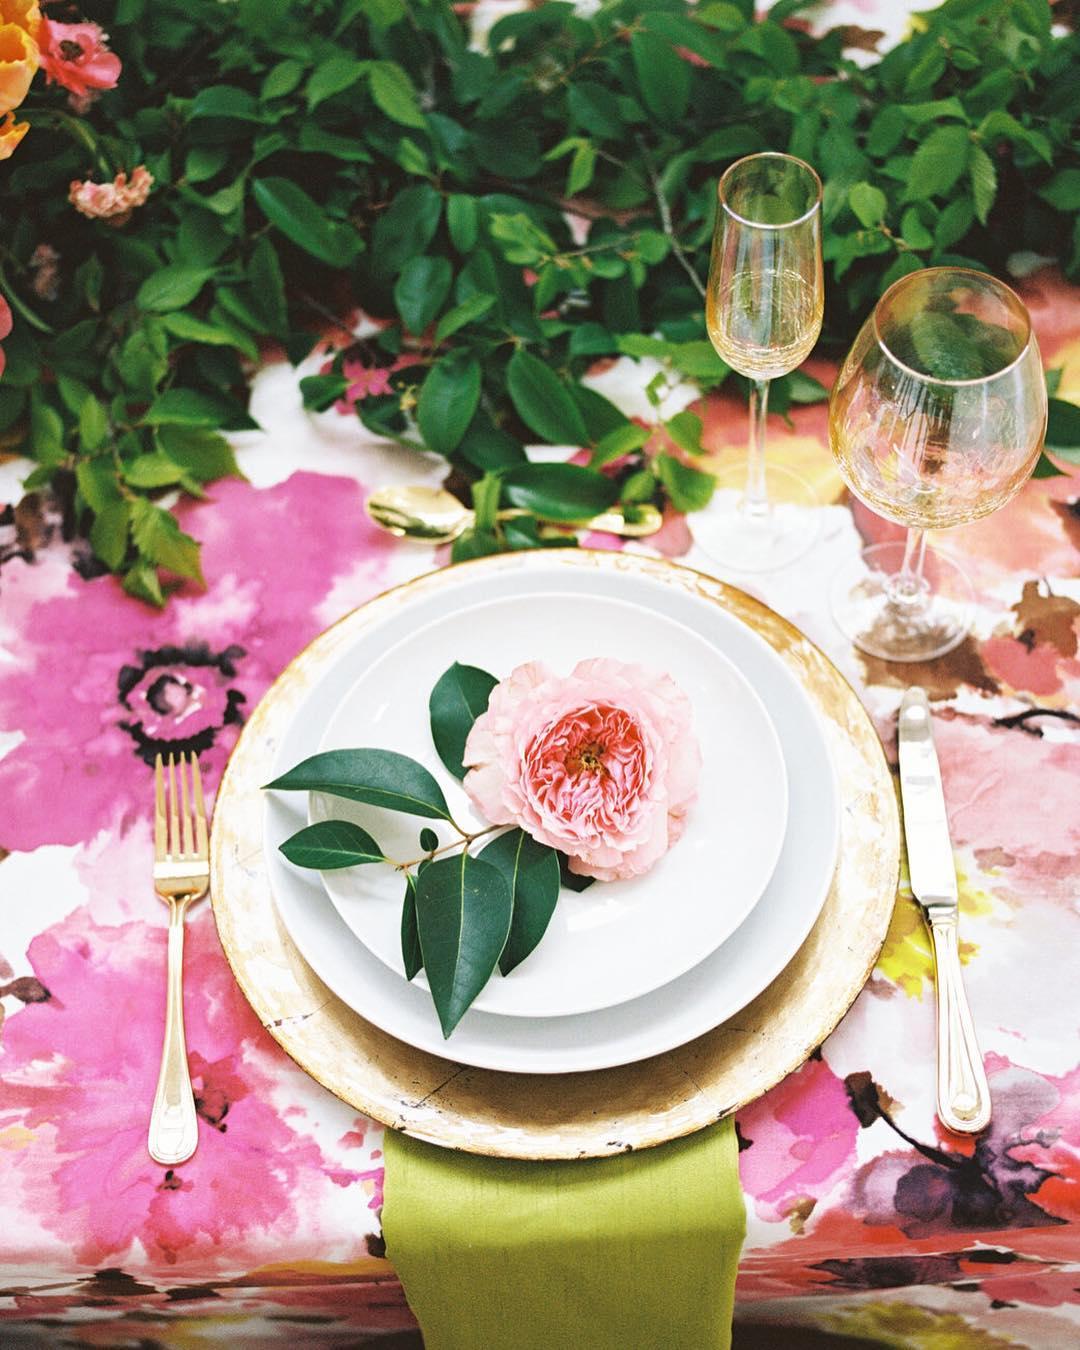 table decor for spring wedding | new spring wedding ideas